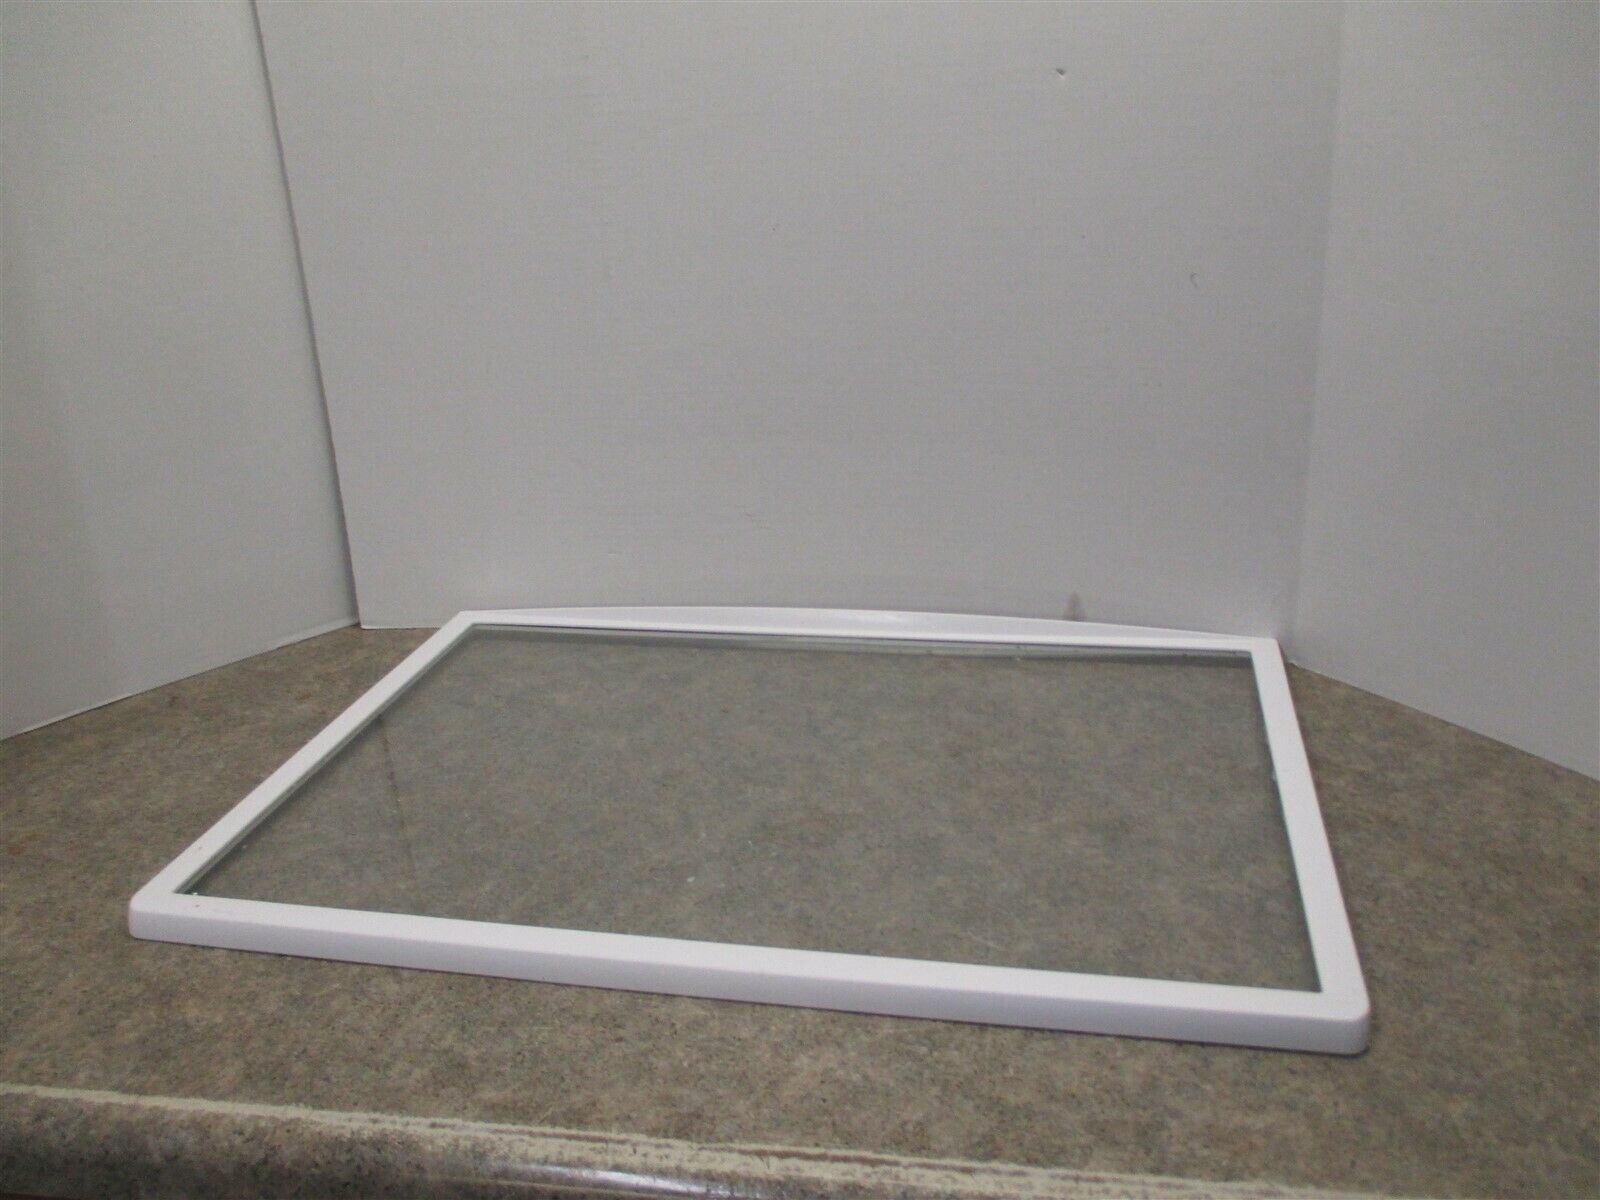 KENMORE SLIDING GLASS SHELF  25 1/2 X 16 3/4  (SCRATCHES/CLEAR) PART# 240358925 - $65.50